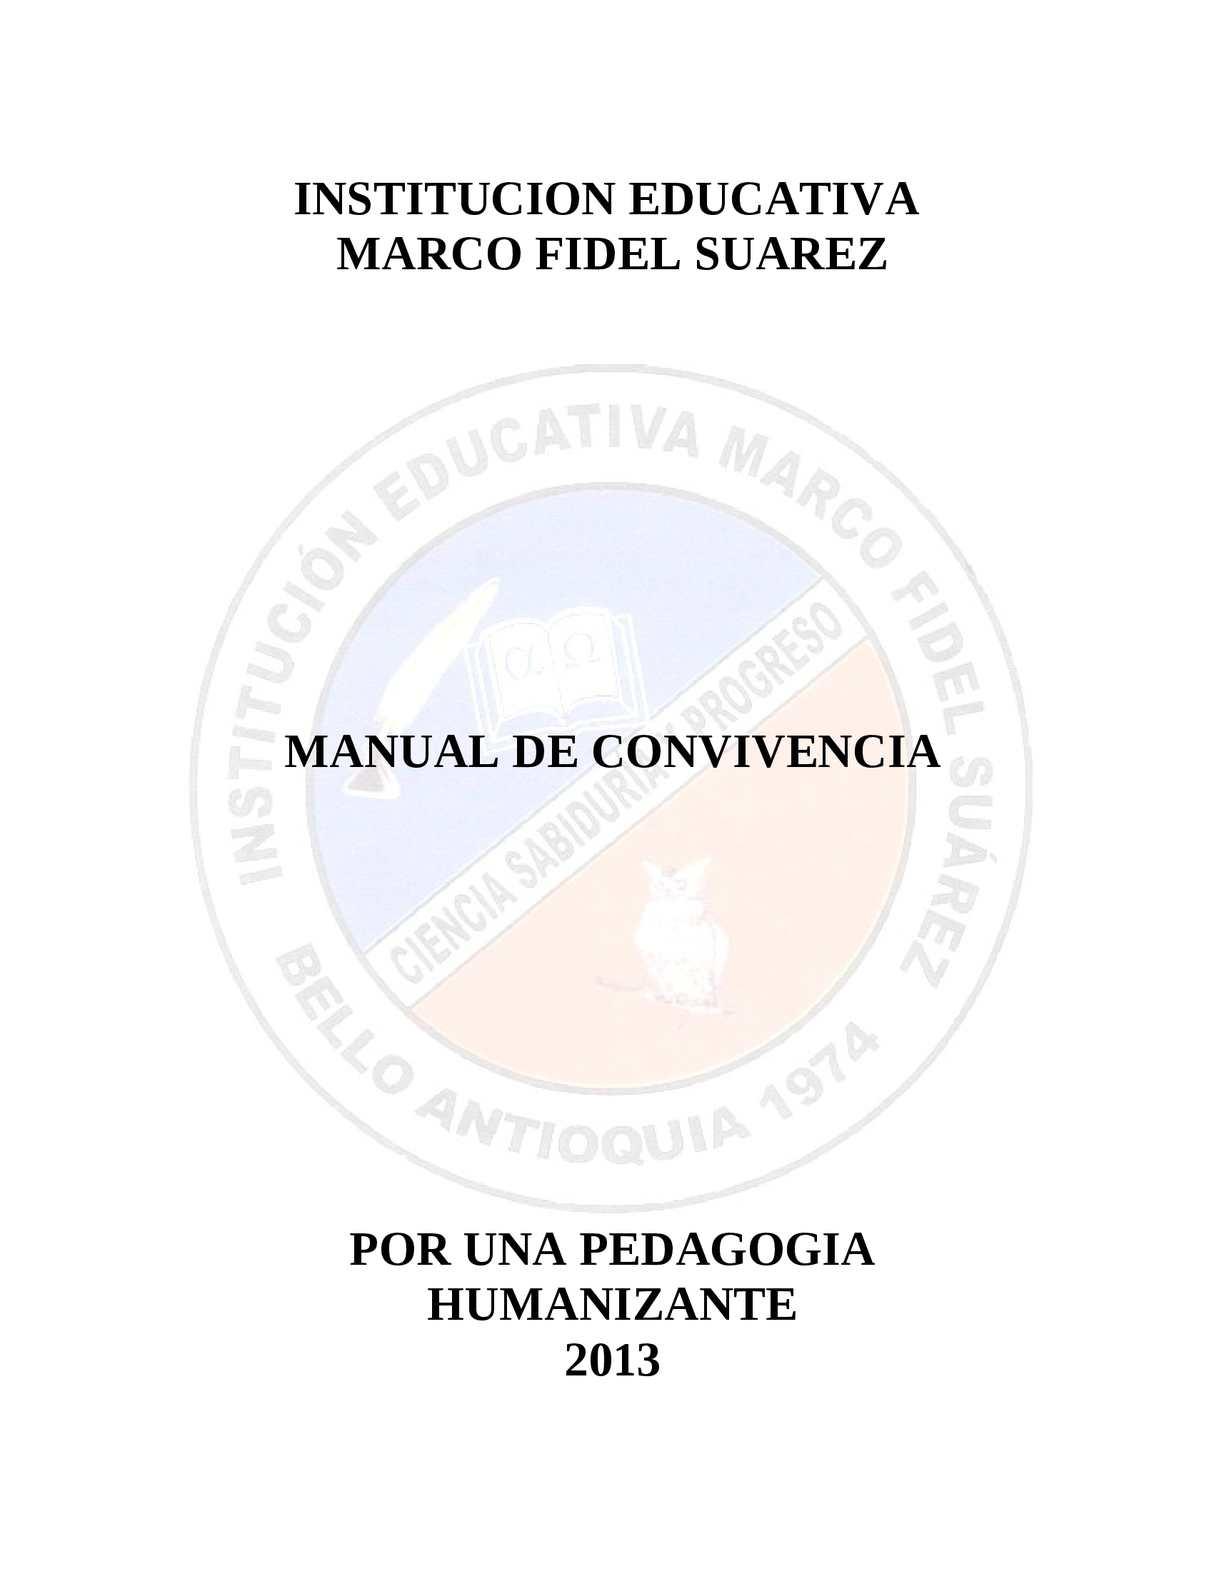 Calaméo - MANUAL DE CONVIVENCA IEMFS